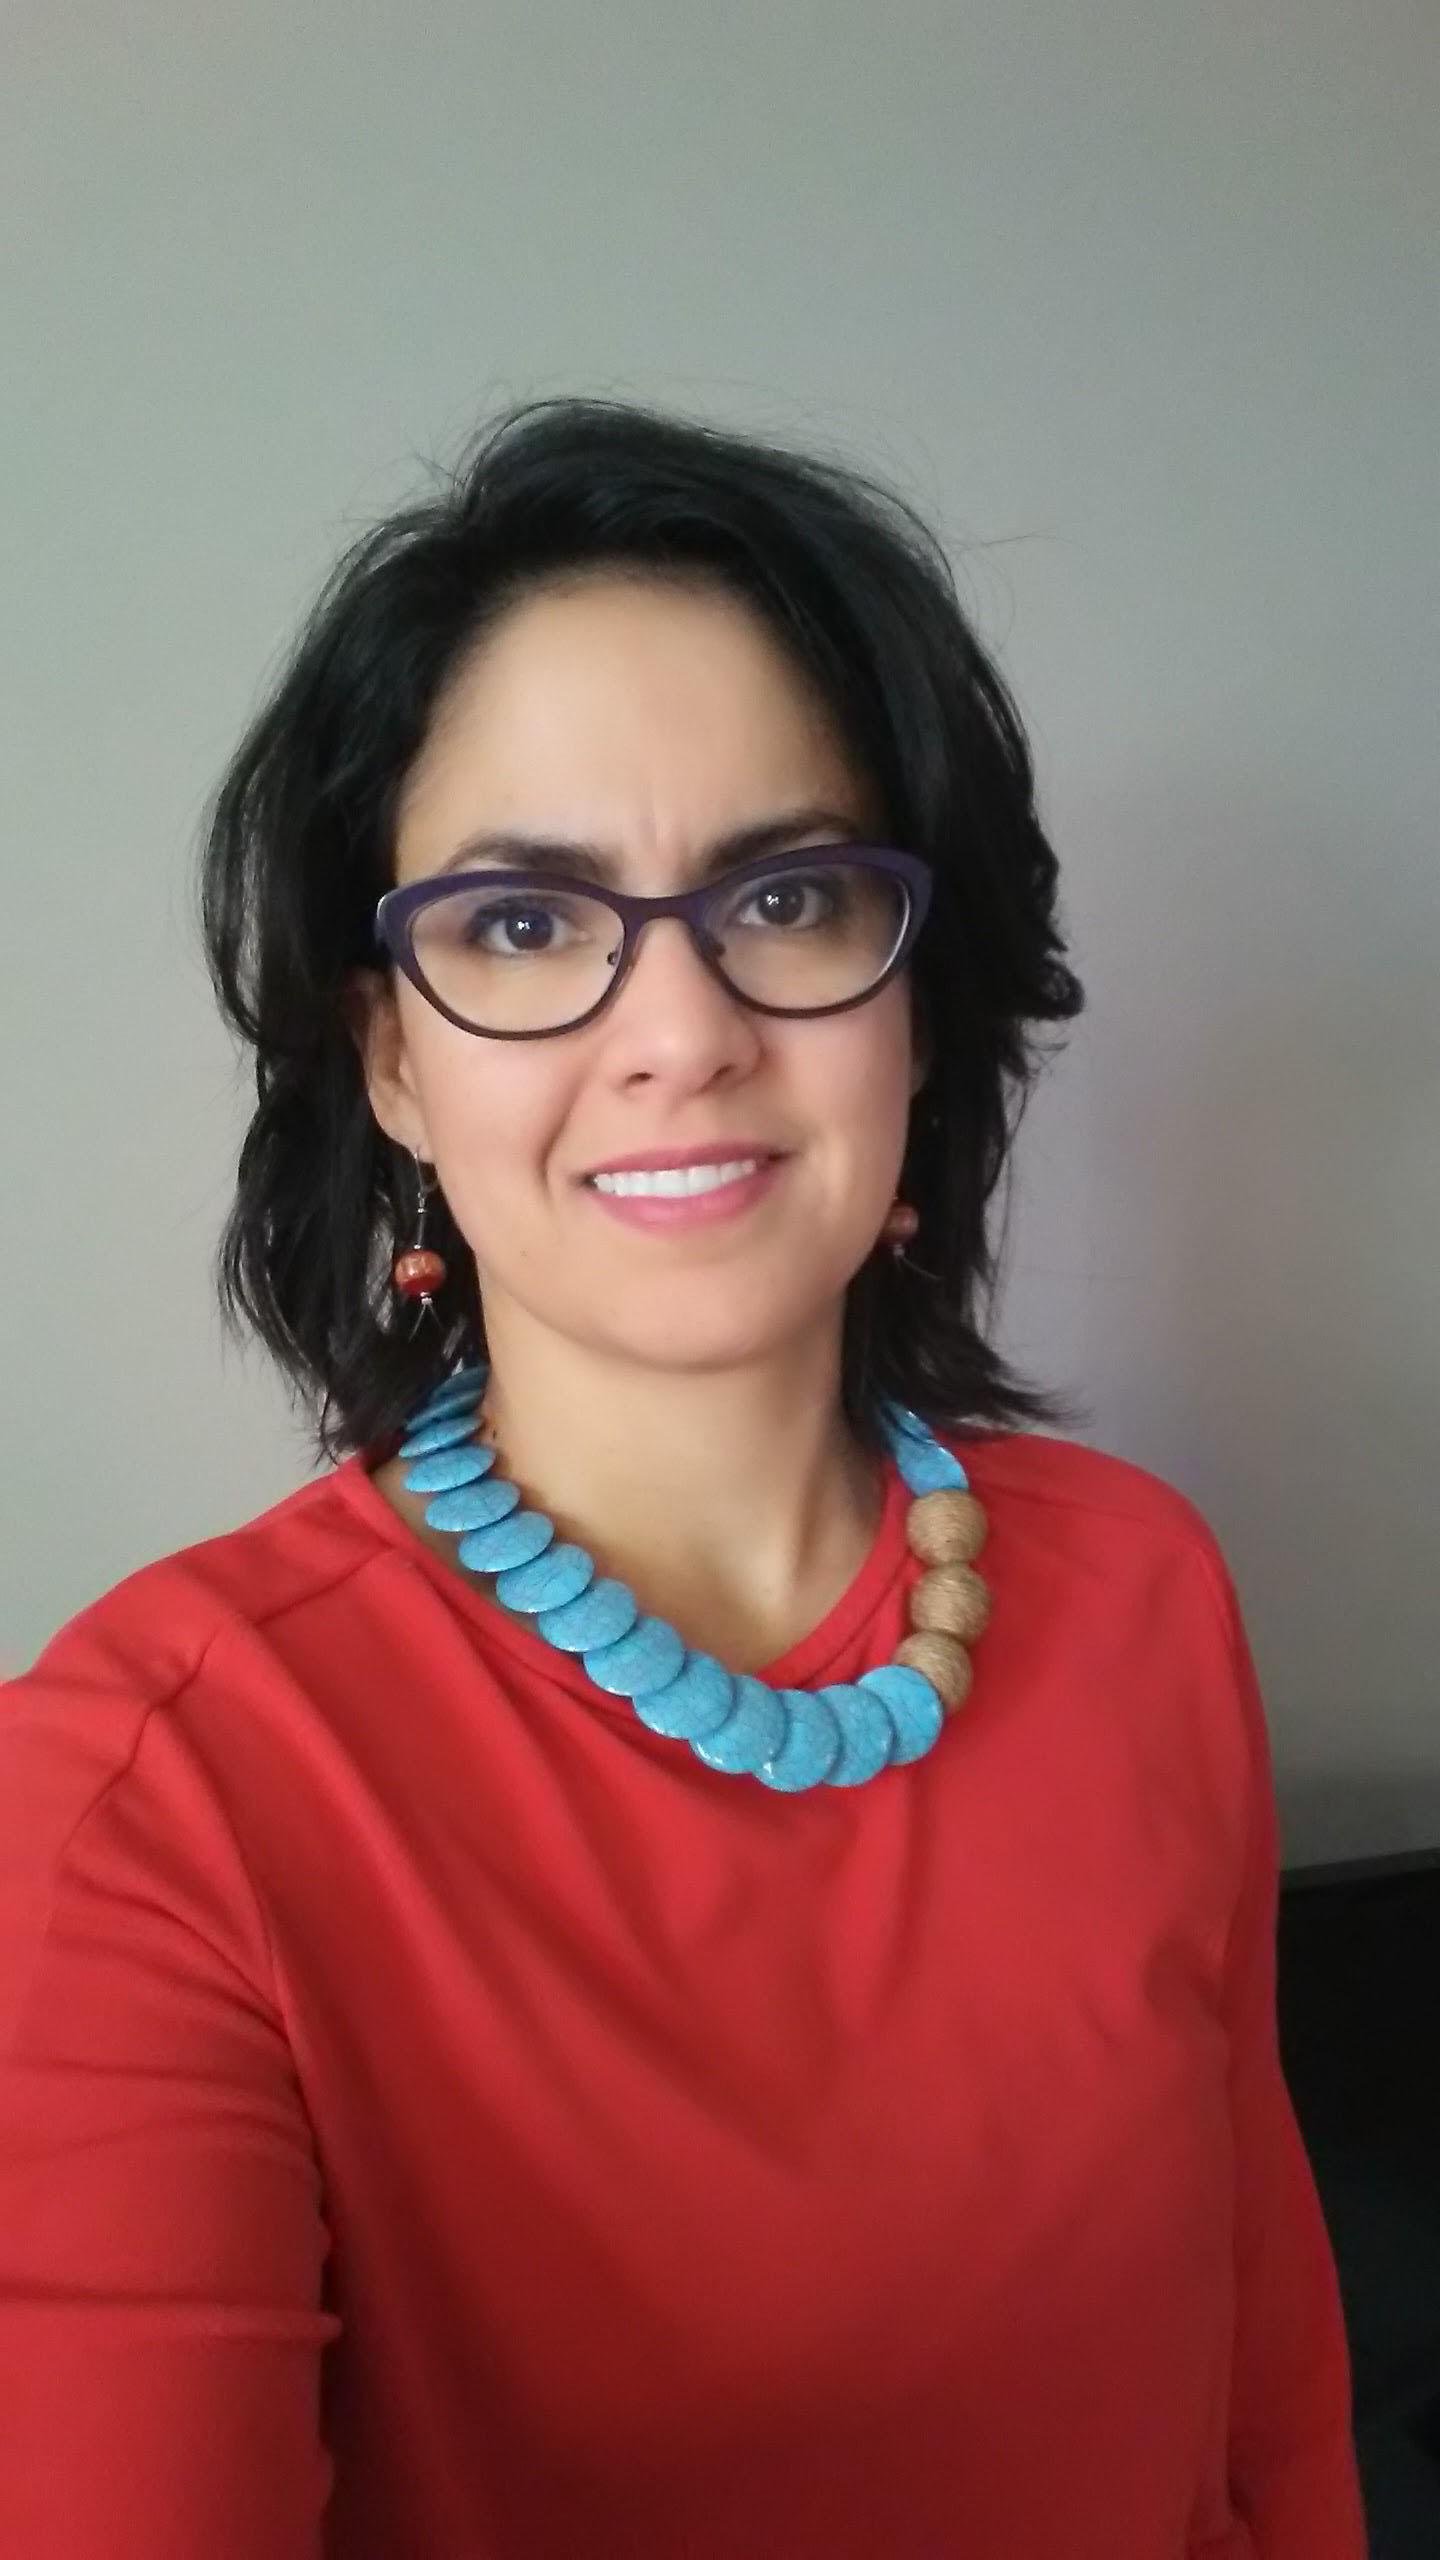 Izabel Amaral